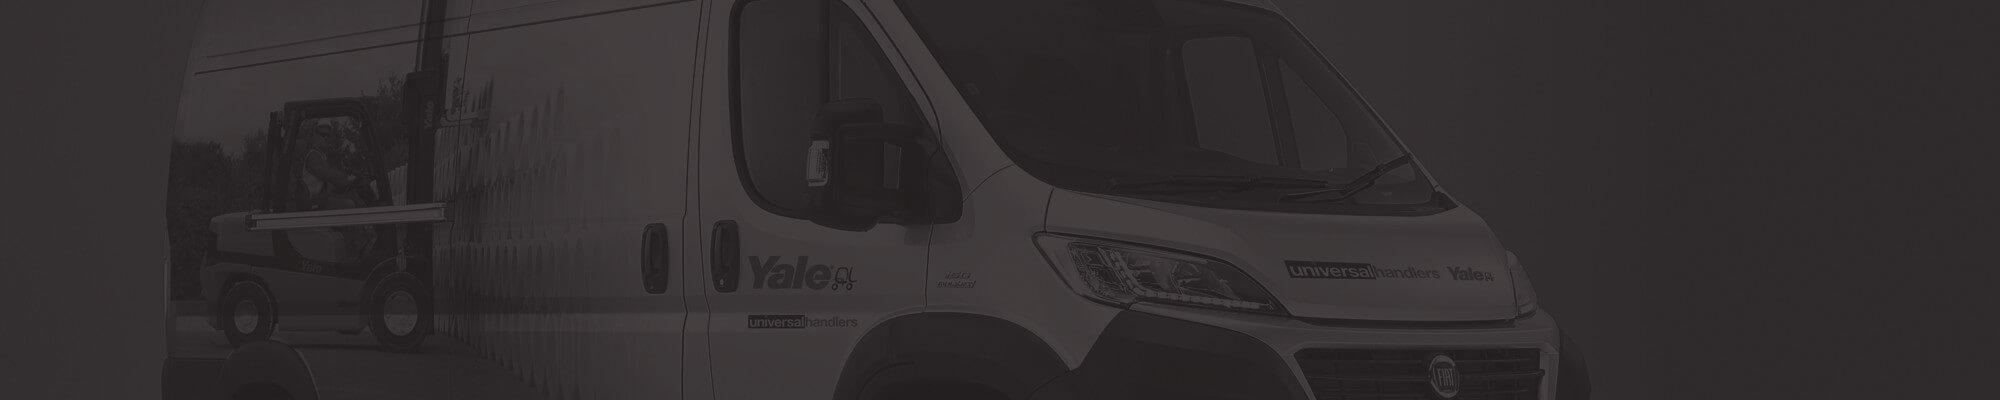 Hyster Yale Vehicle Artwork design